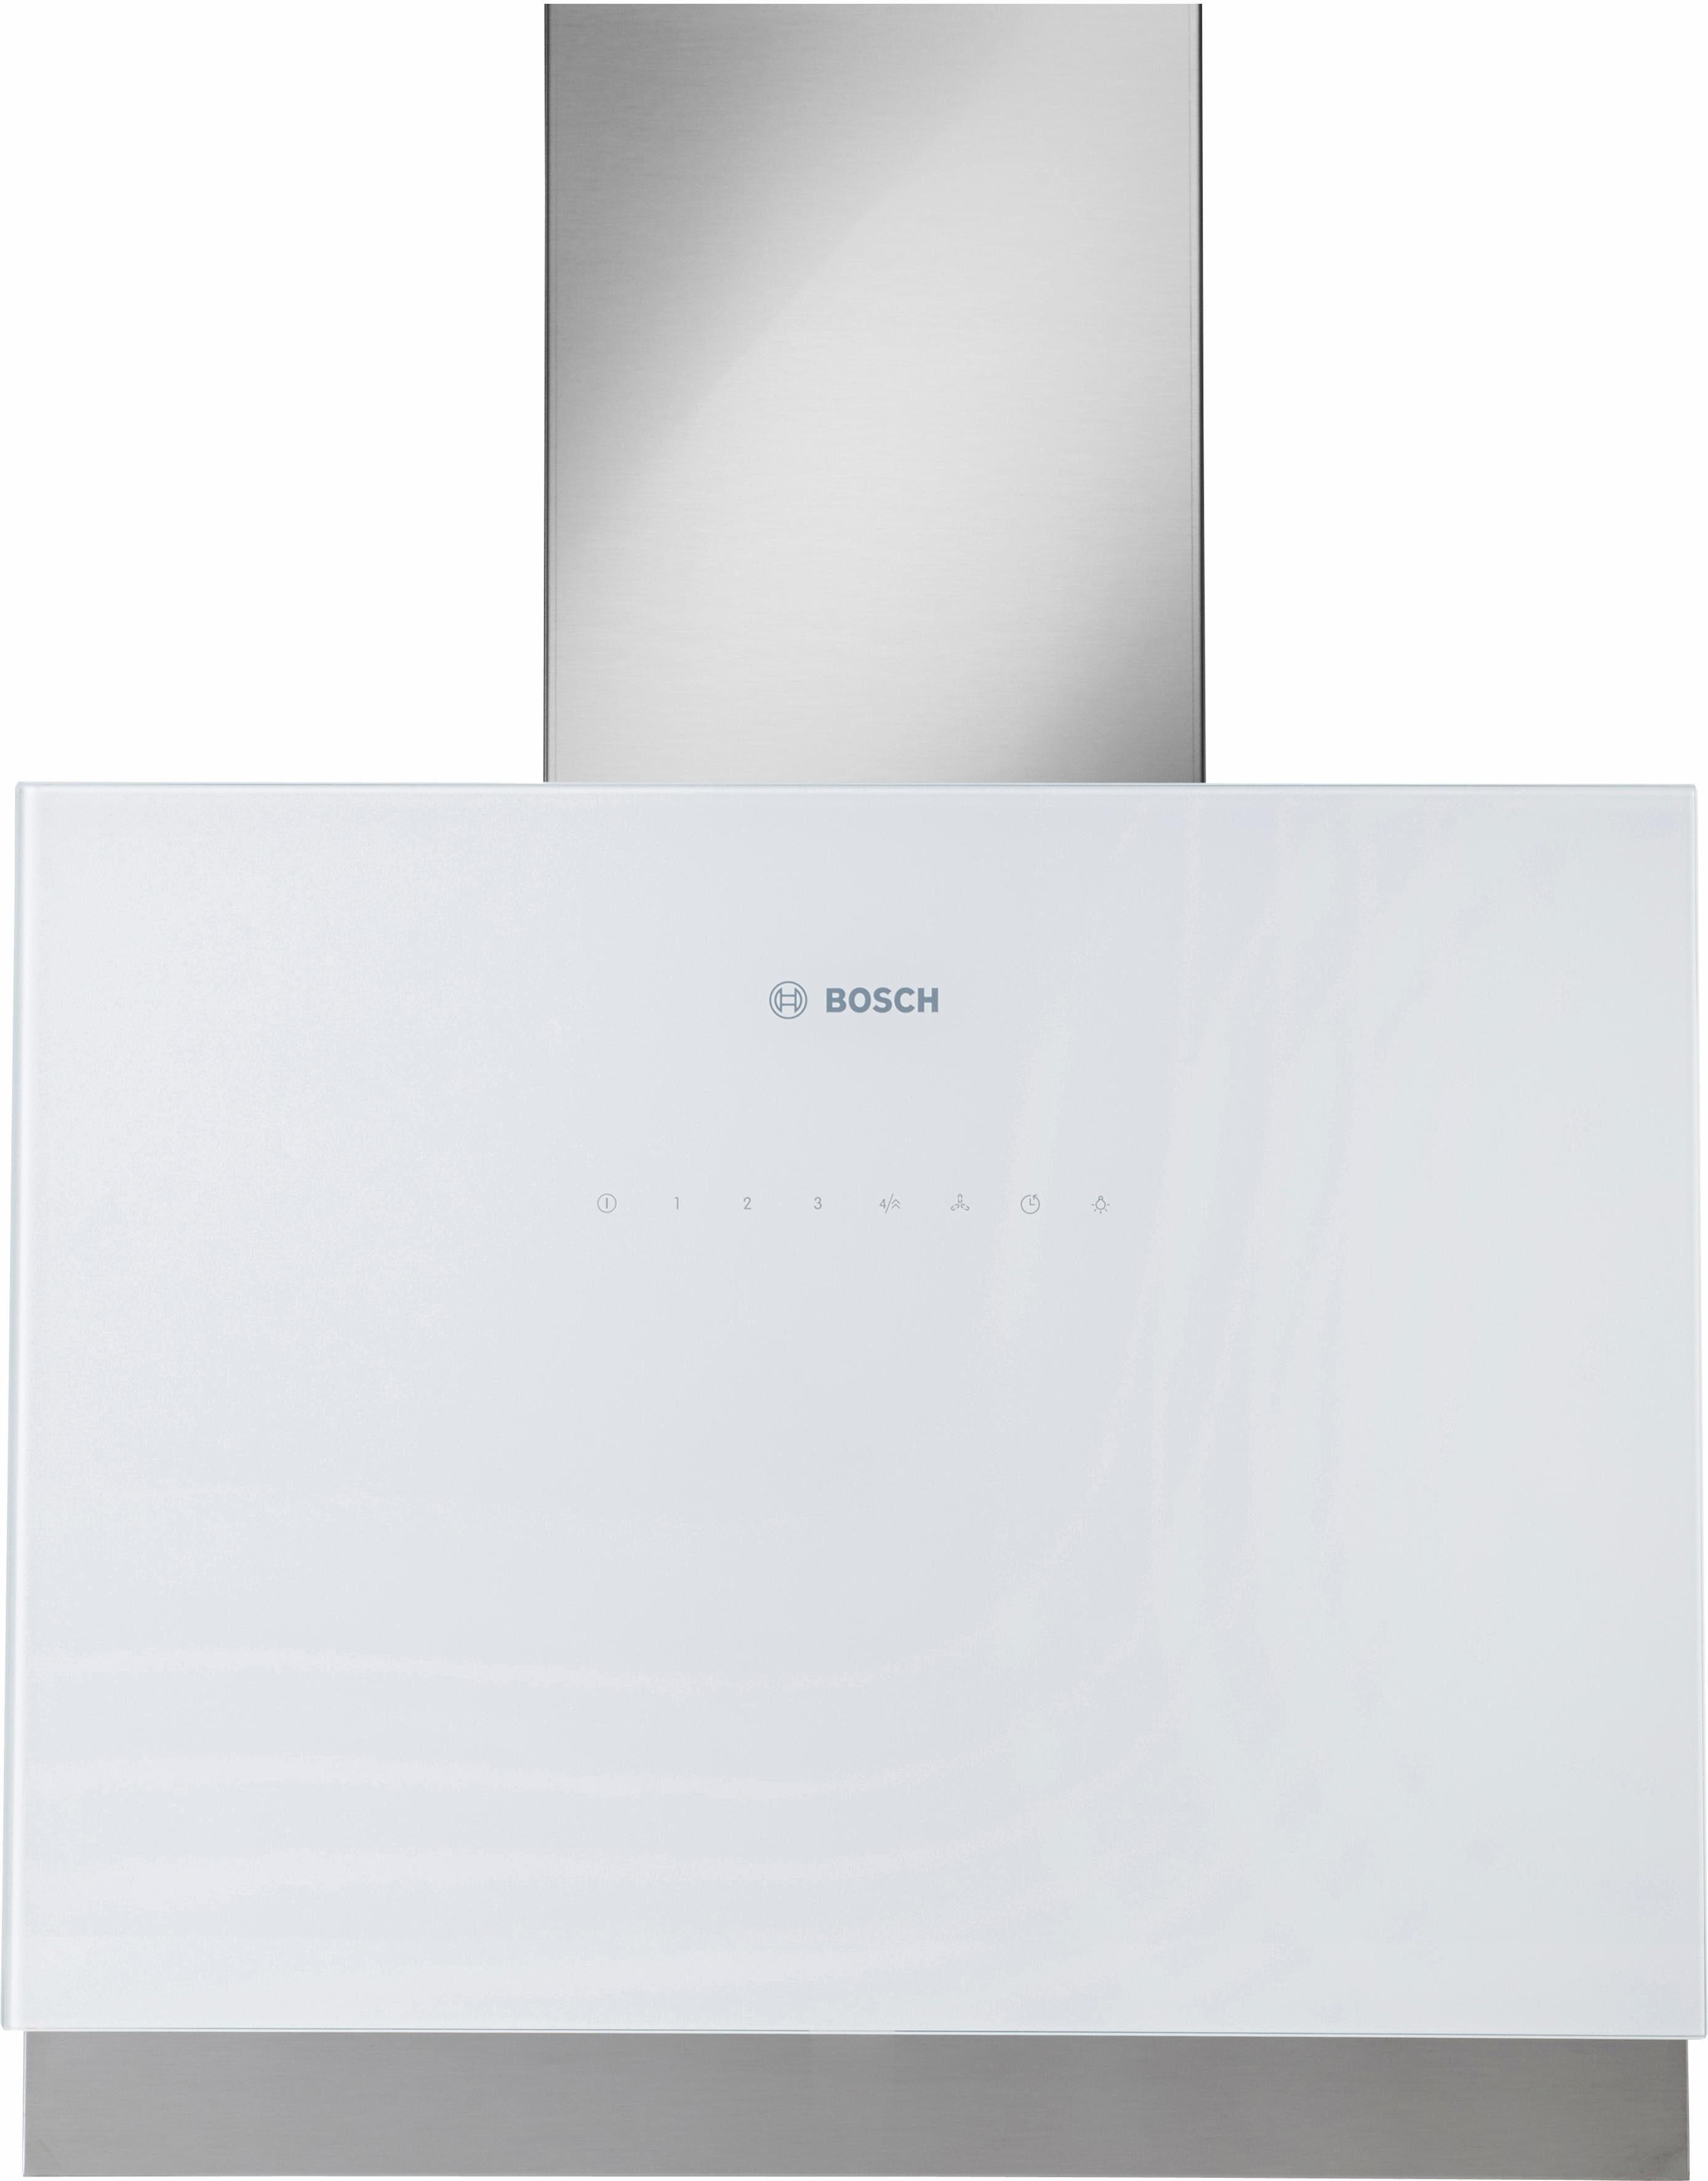 Bosch Kopffreihaube DWK068G21